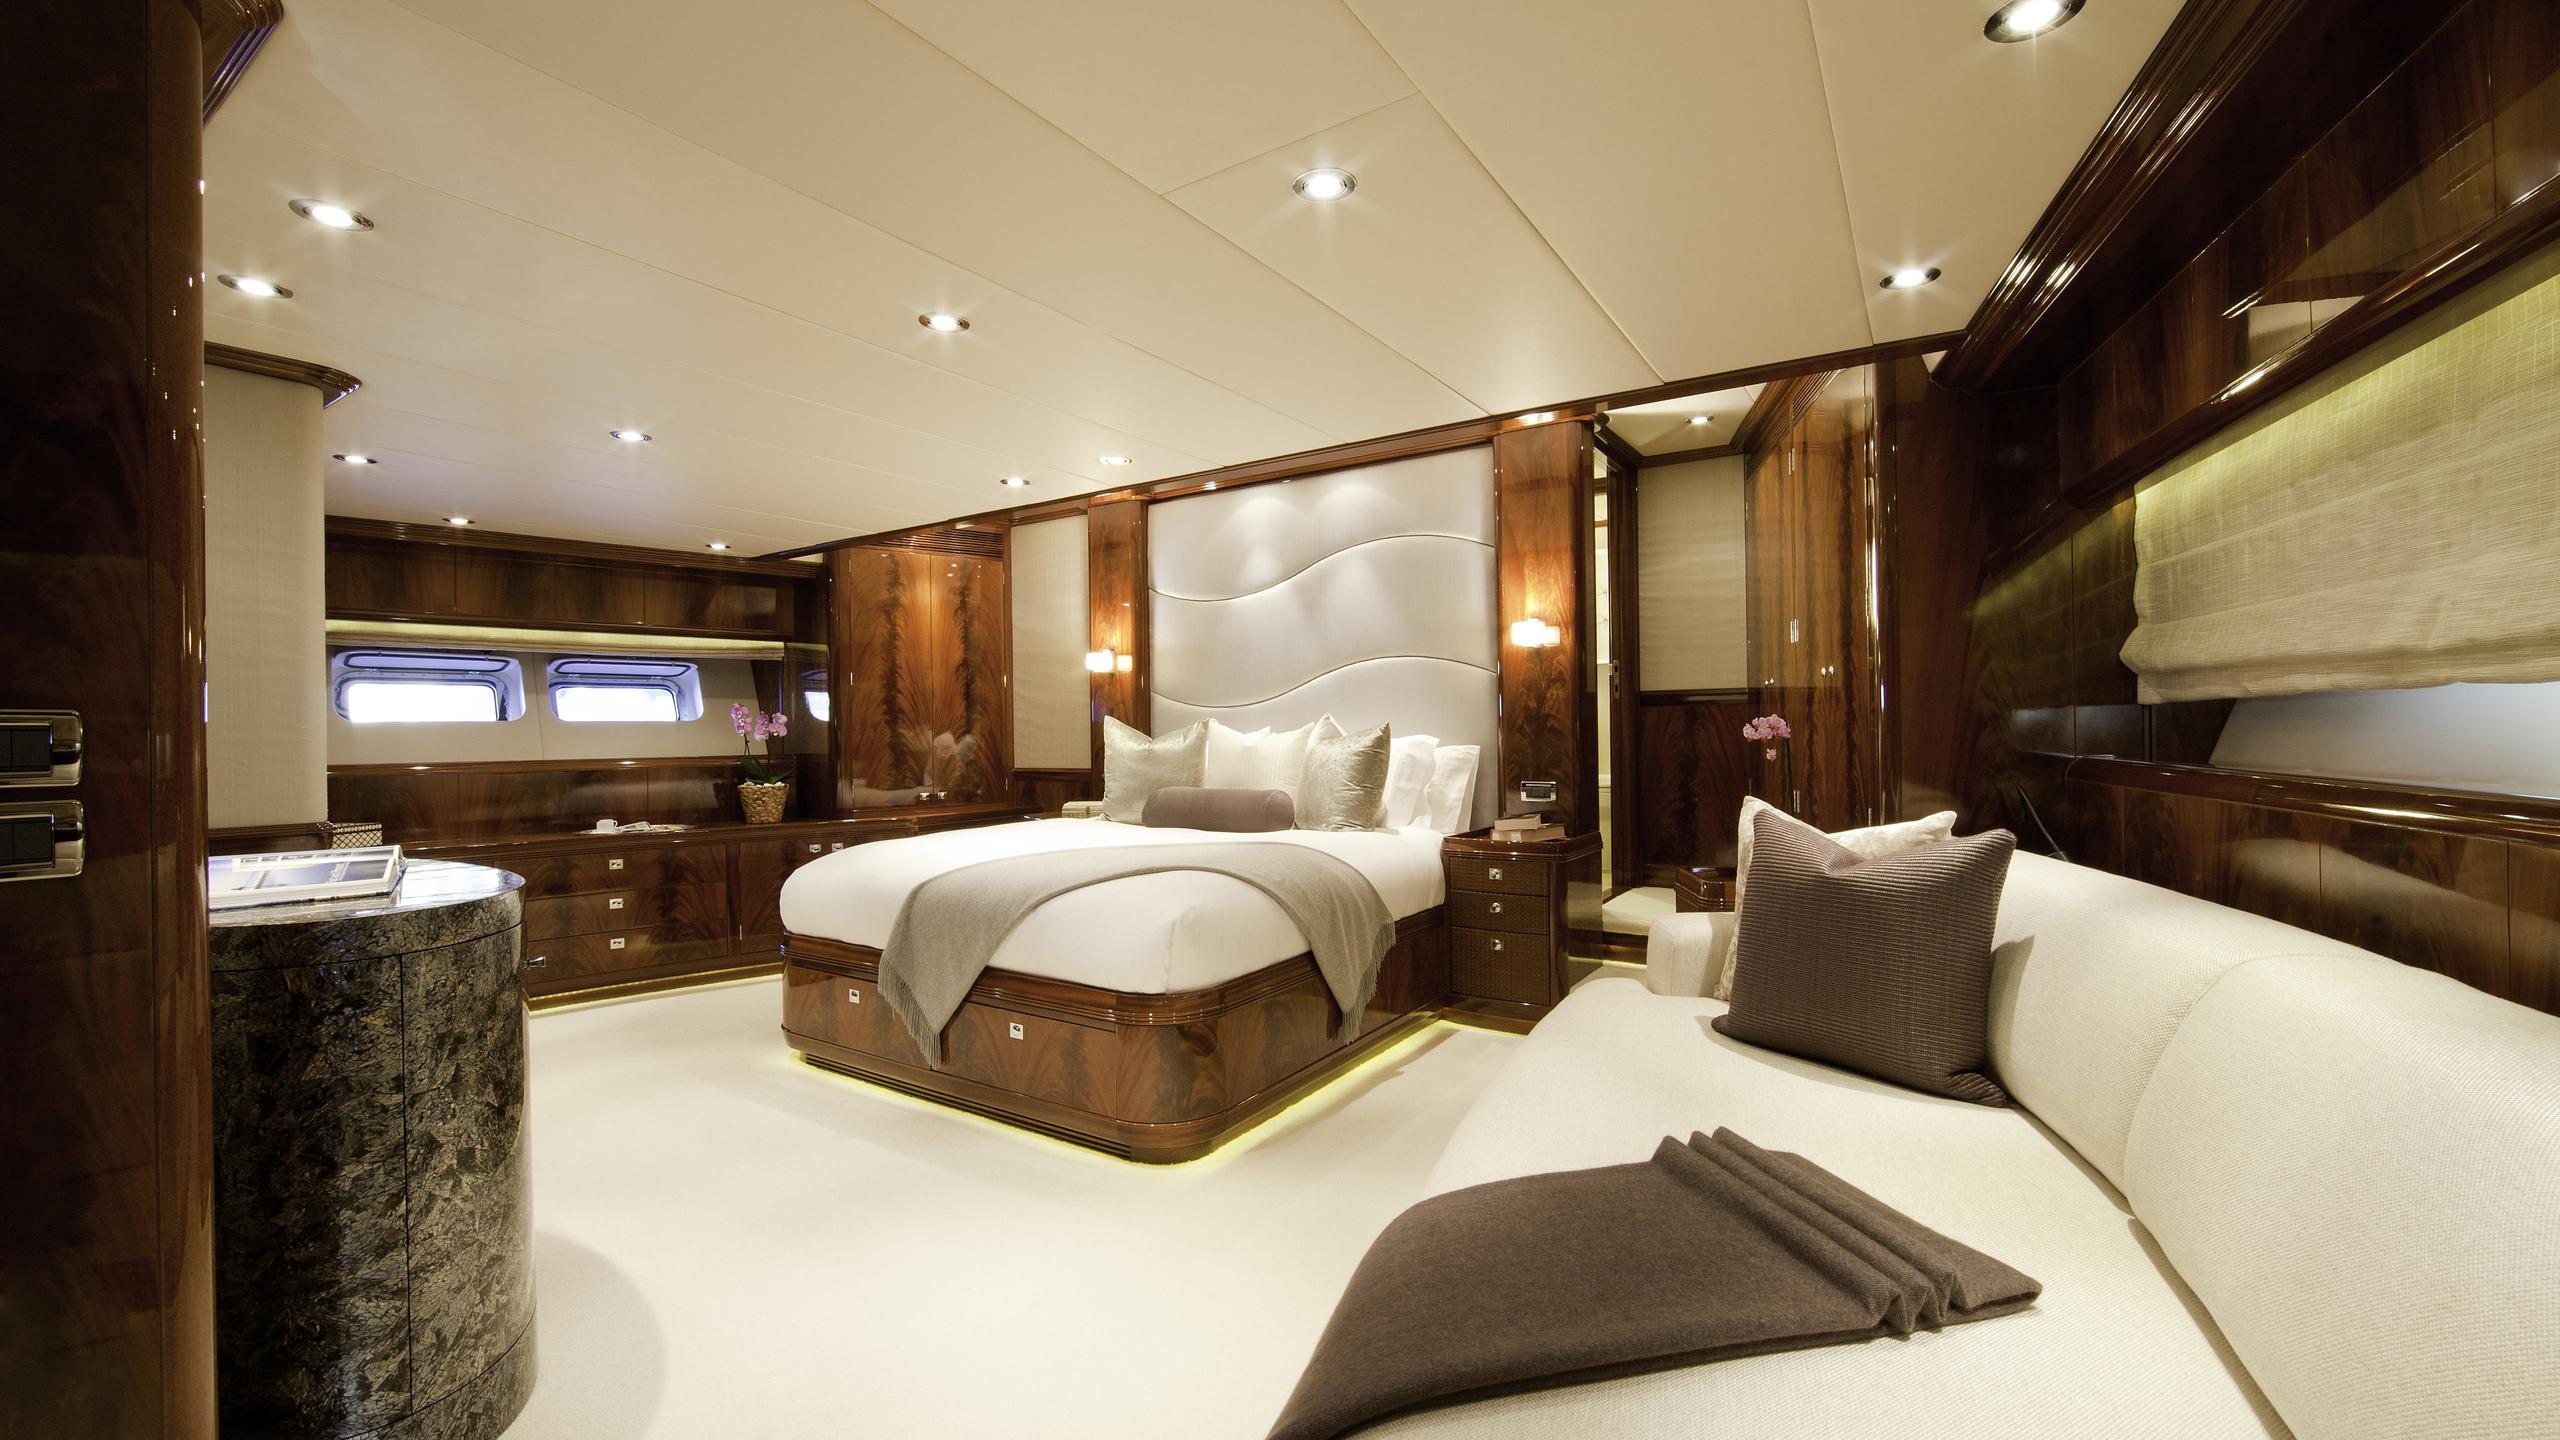 destination-fox-harb'r-yacht-master-cabin